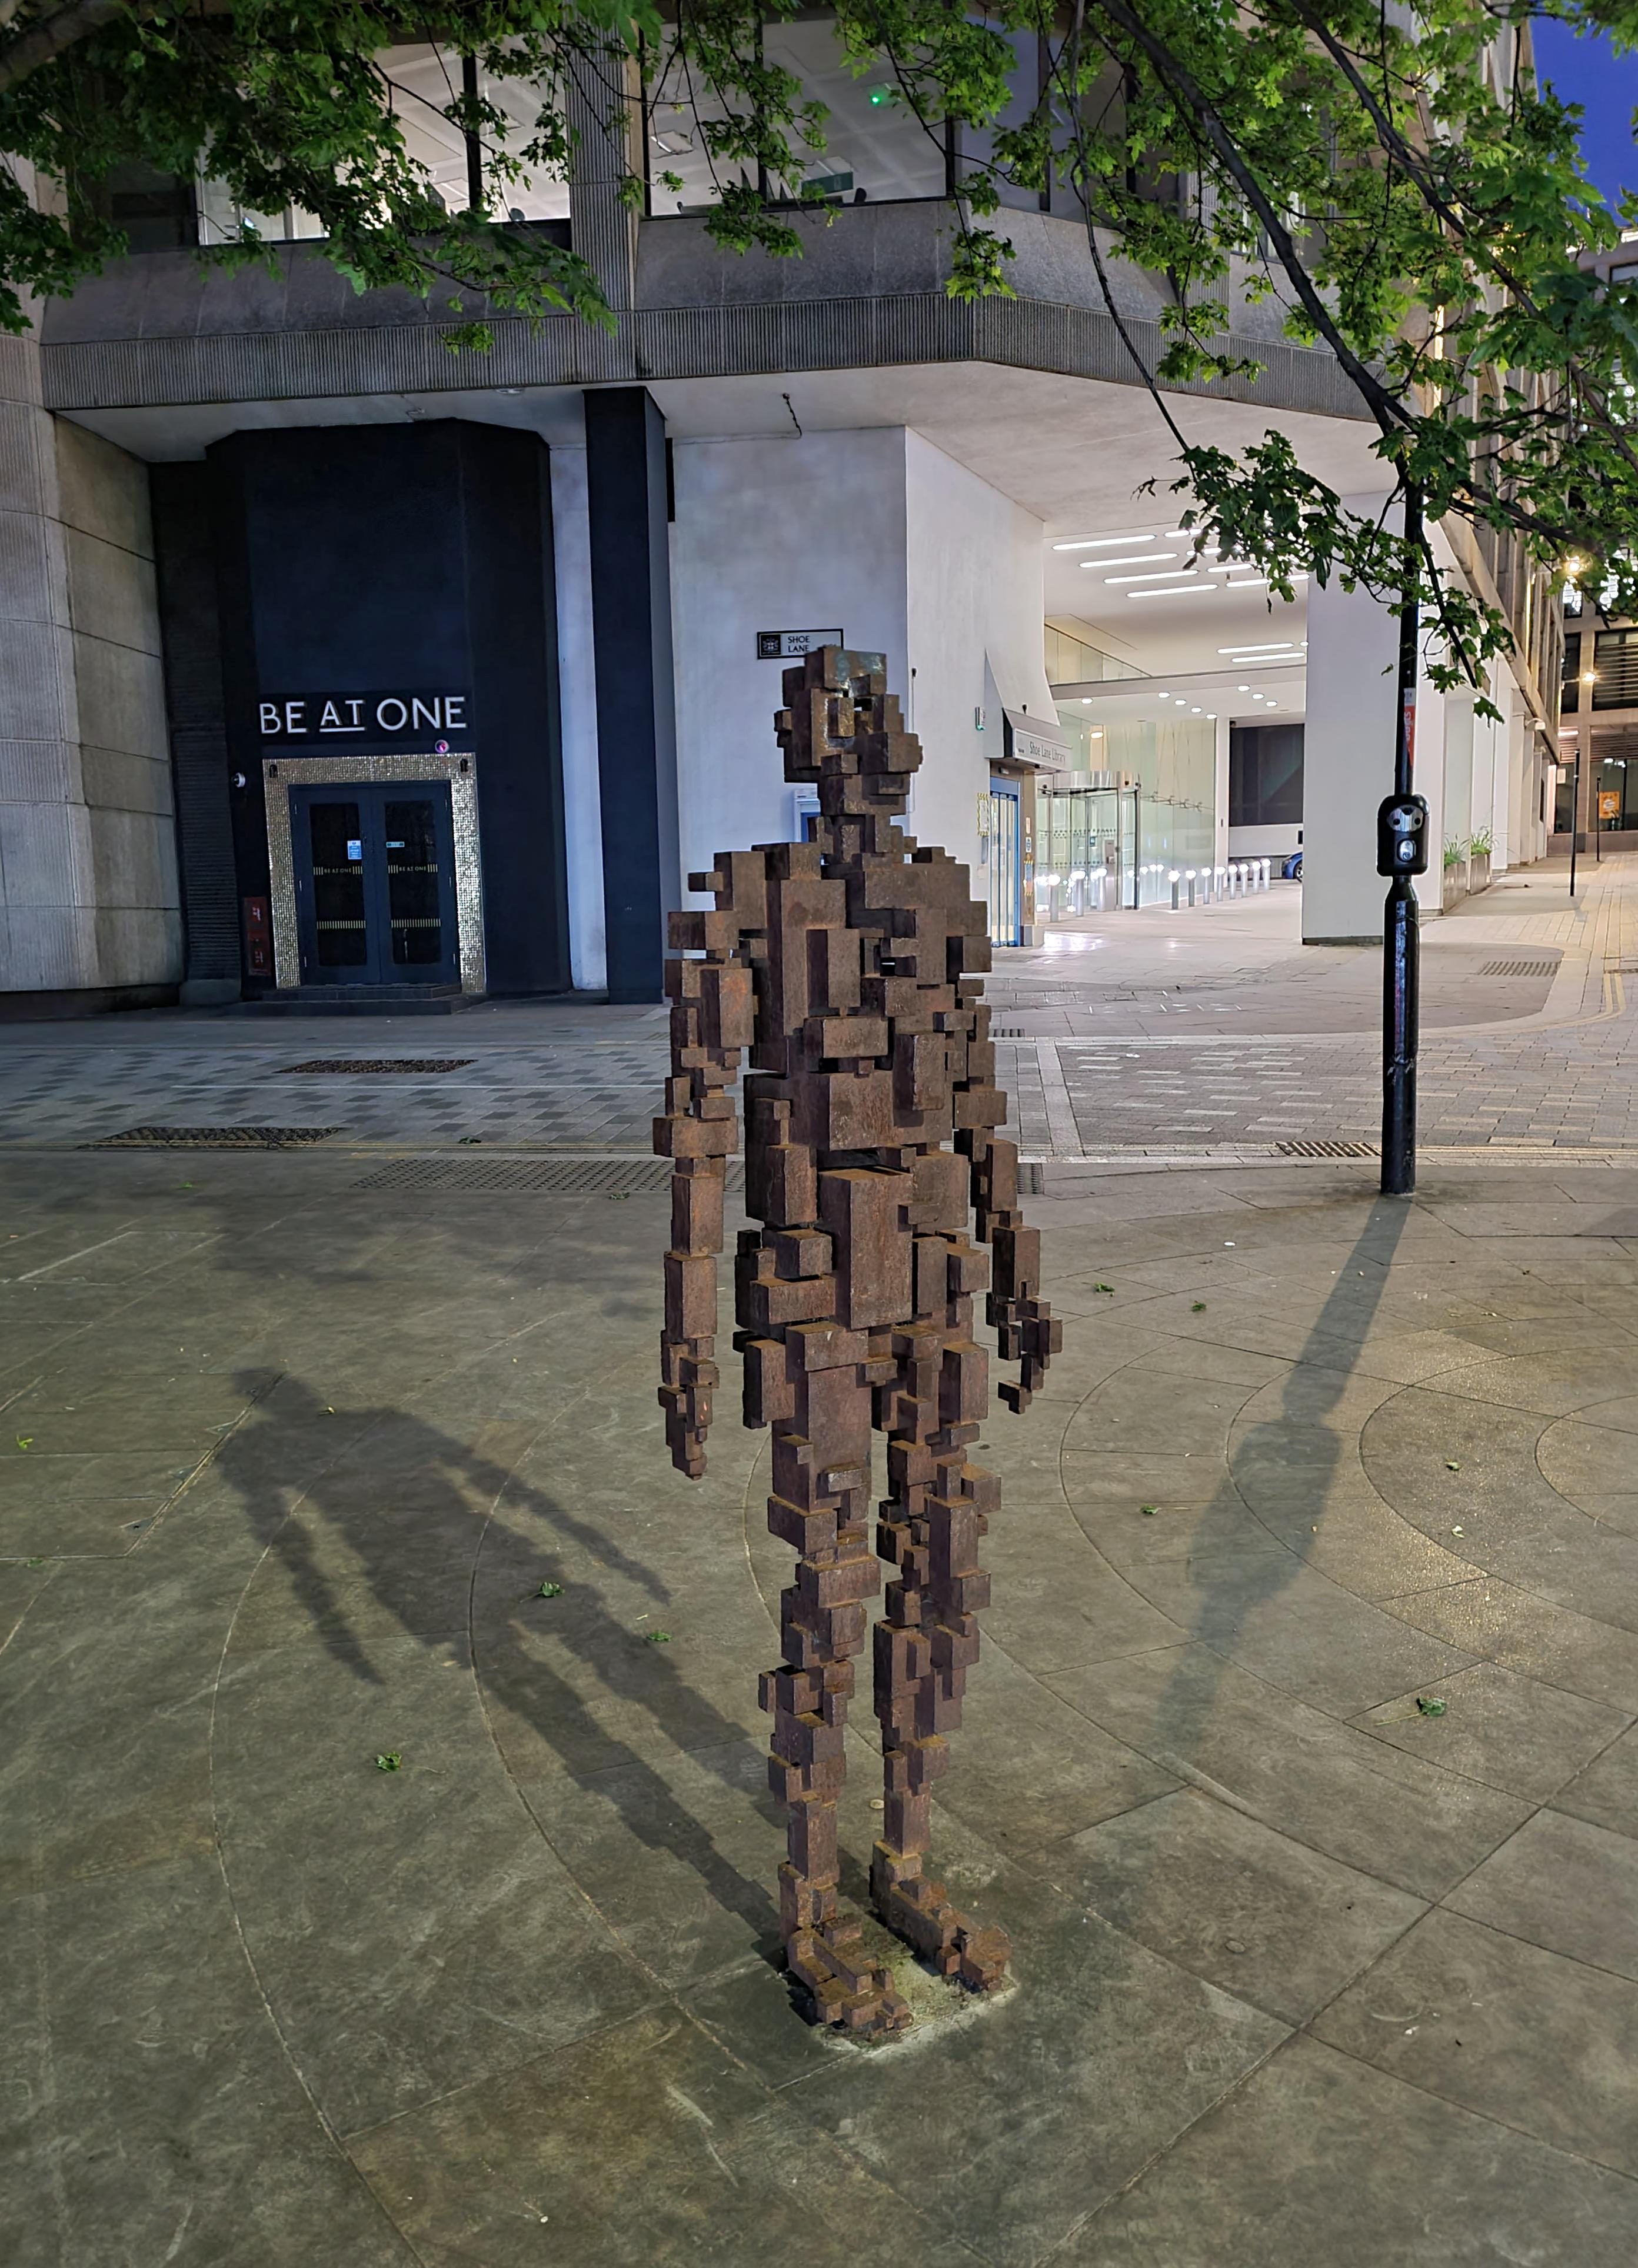 Resolution, by Antony Gormley. Corner of Shoe Lane and Bride Street, 2005